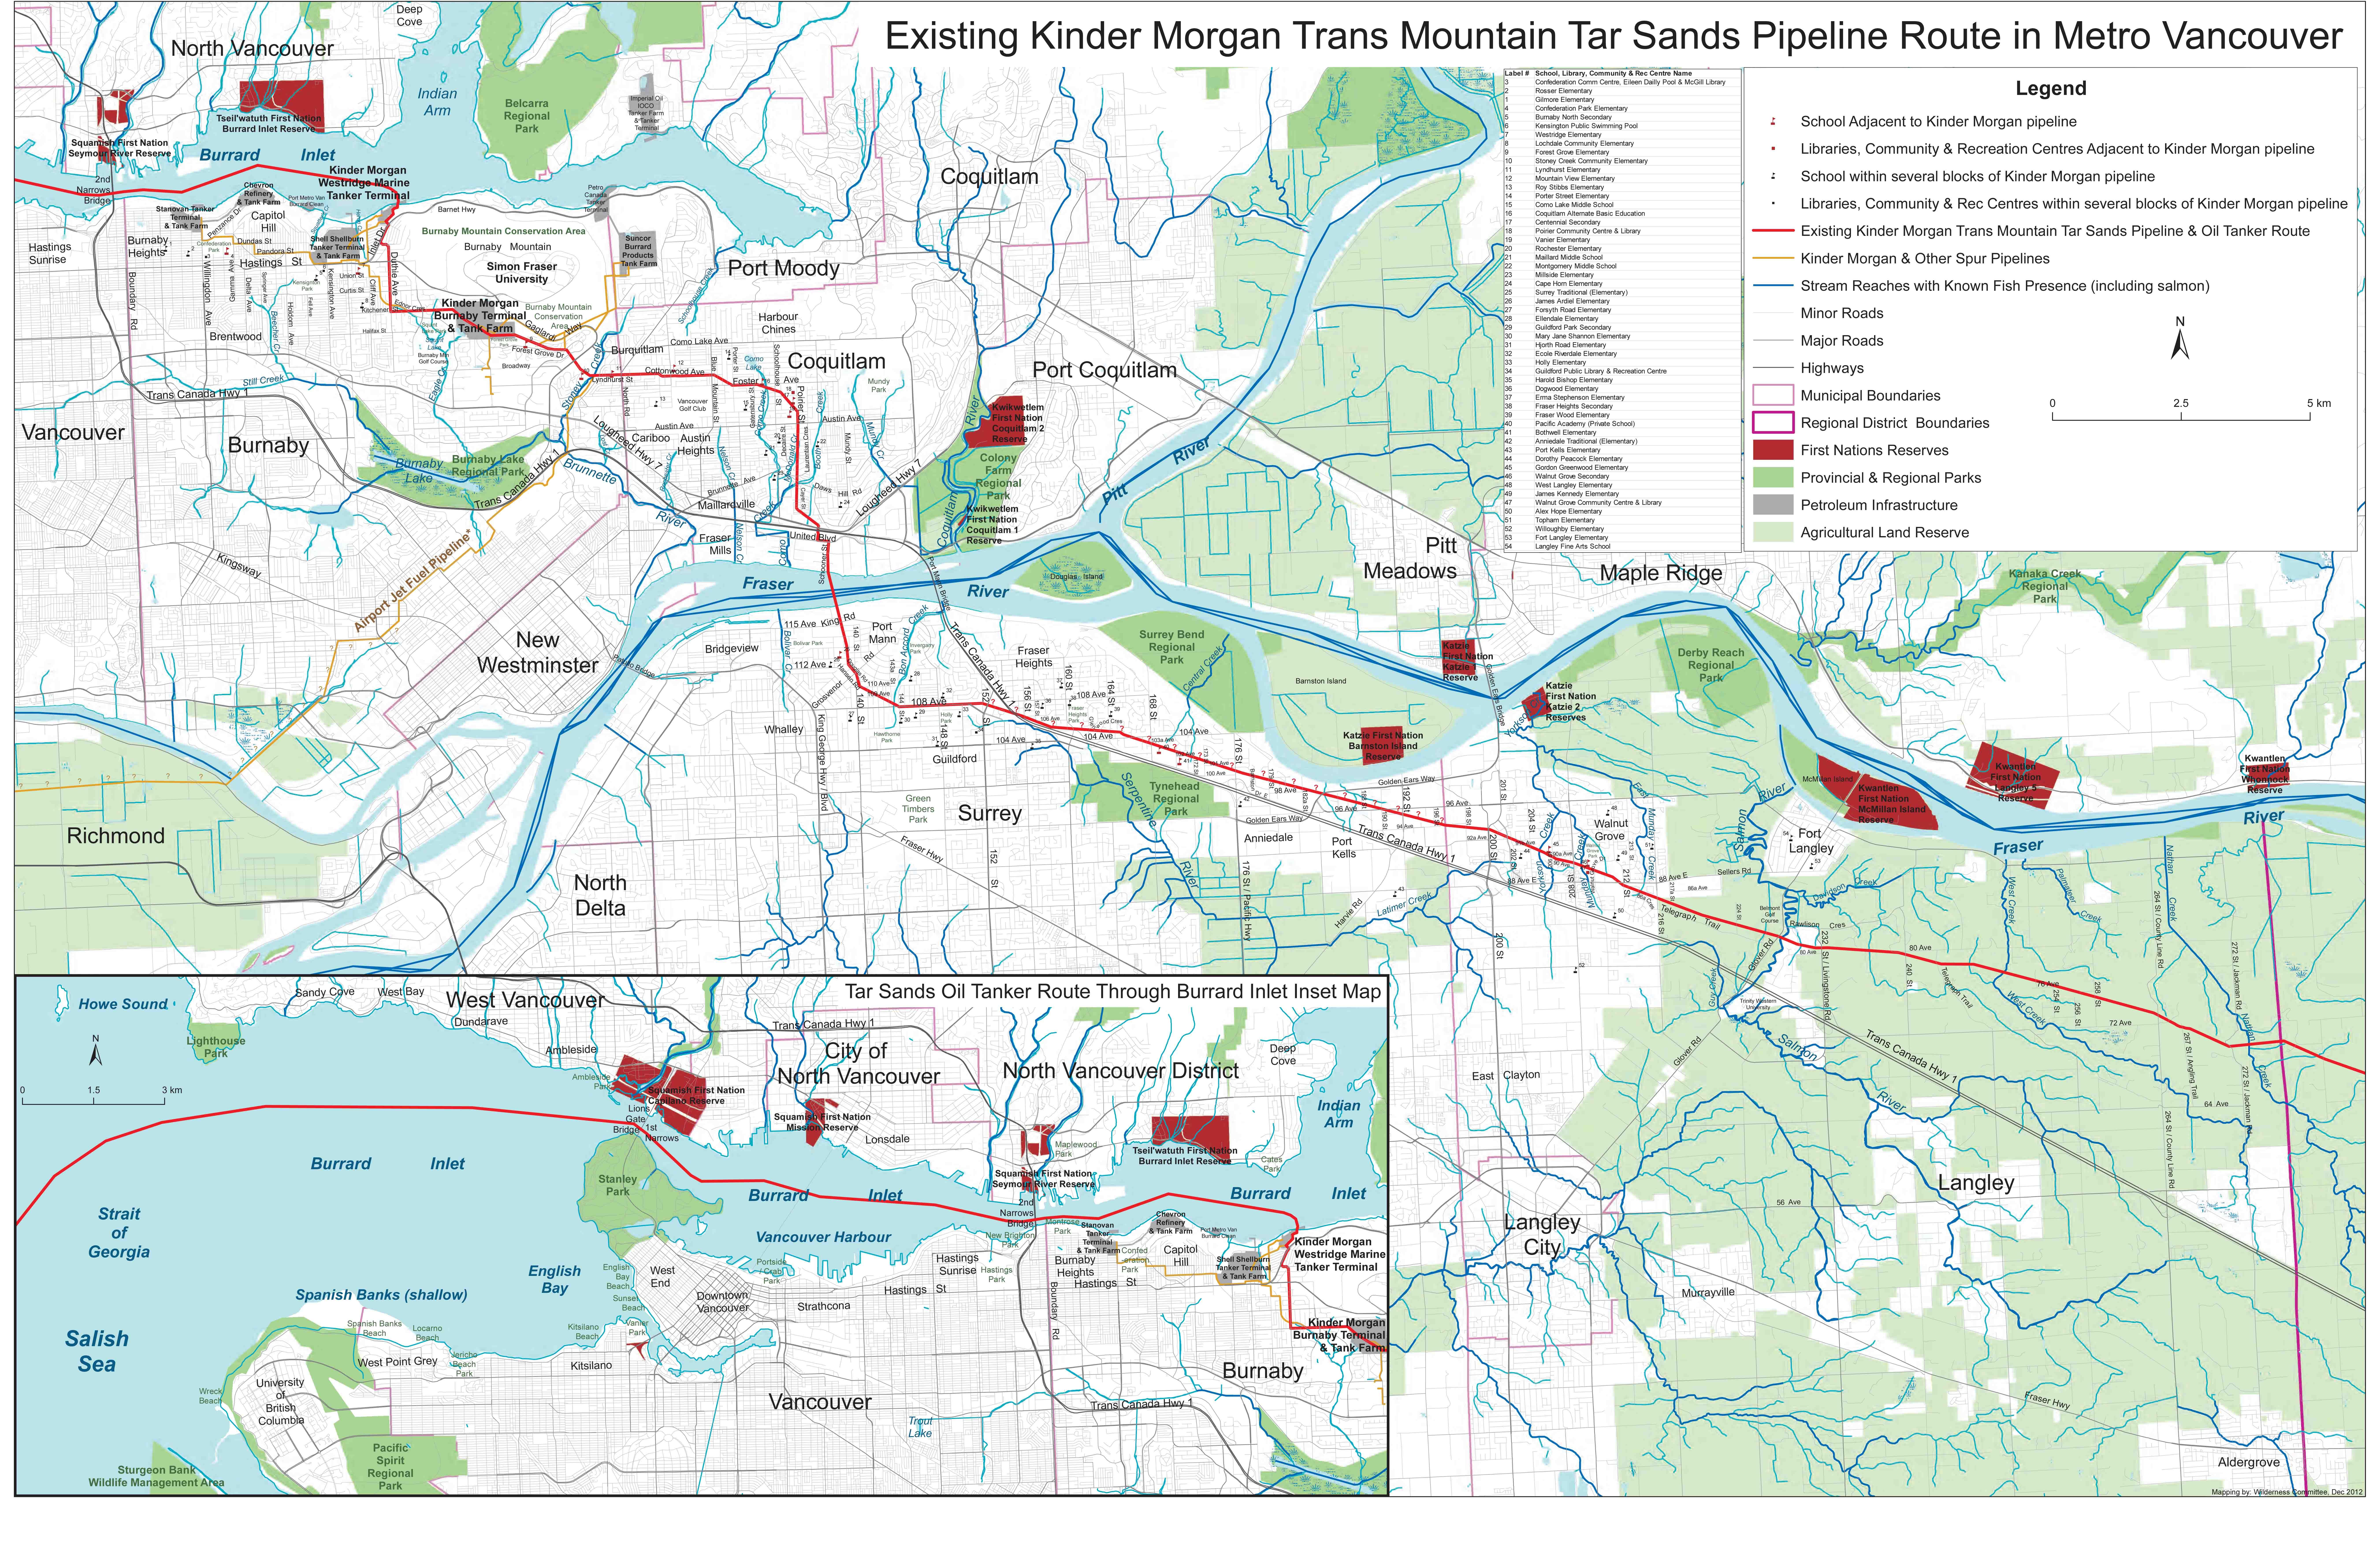 Kinder Morgan Pipeline Route Metro Vancouver